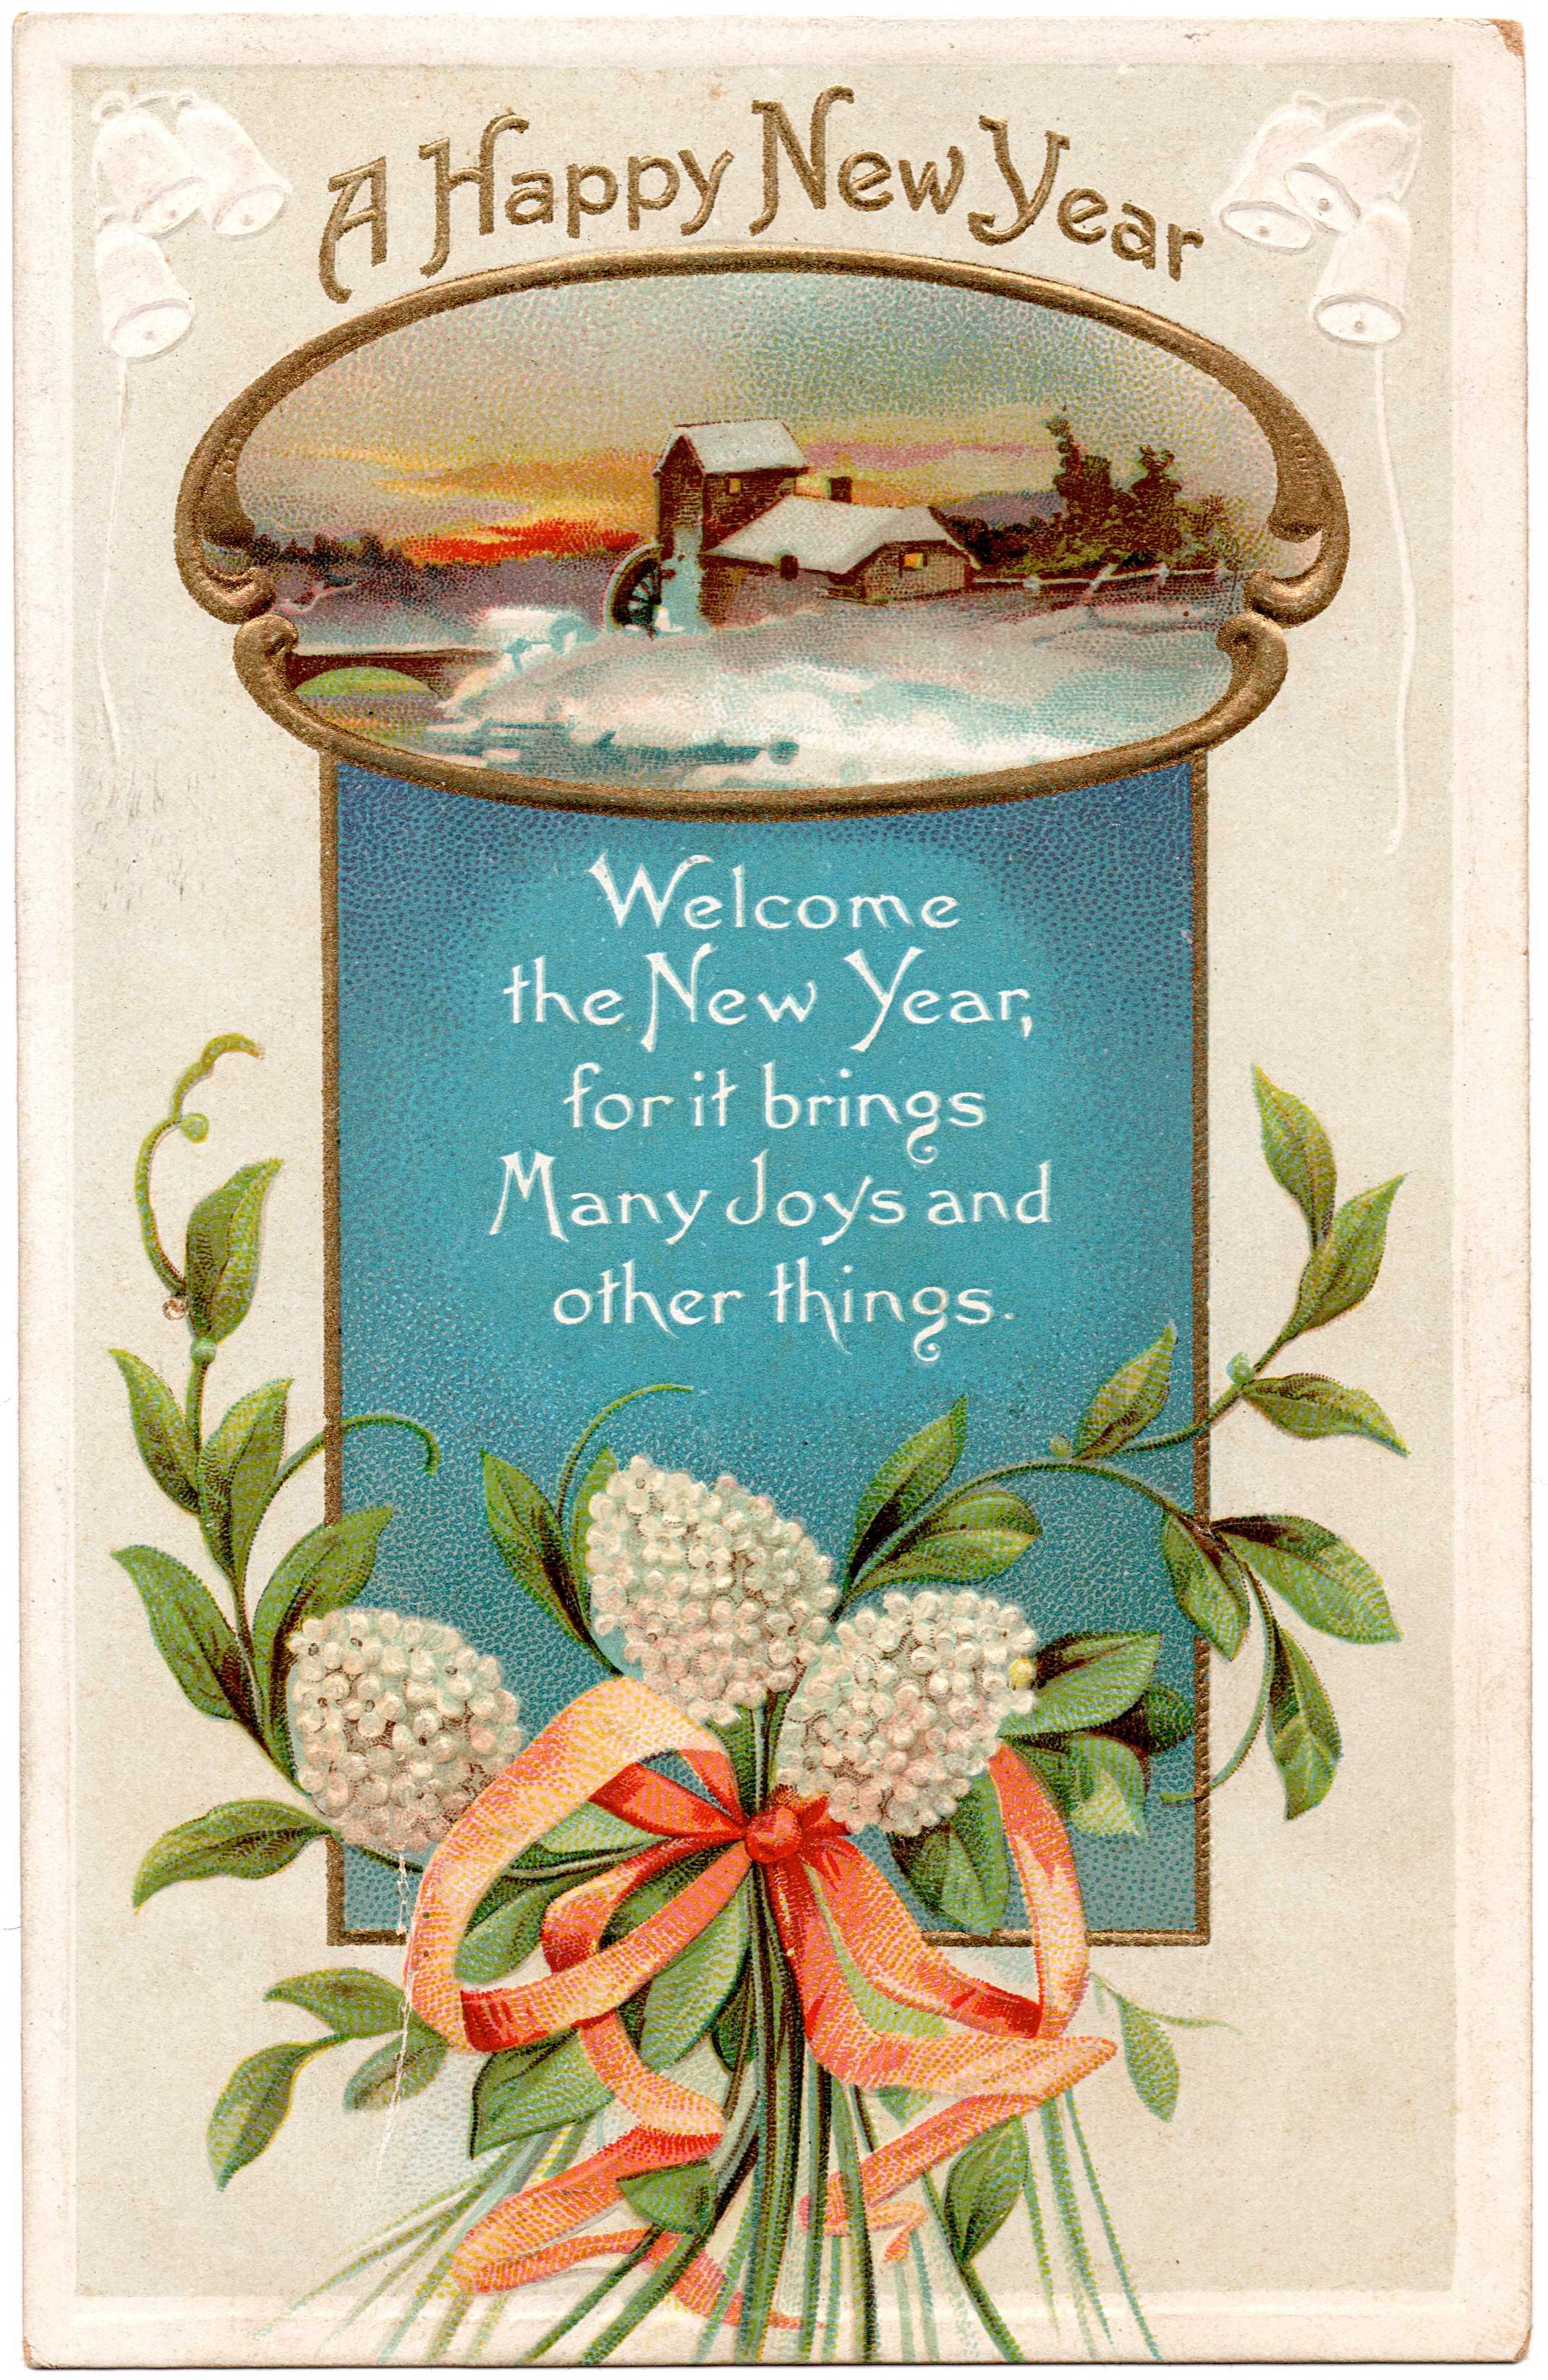 Happy New Year vintage postcard #1 via foobella.blogspot.com